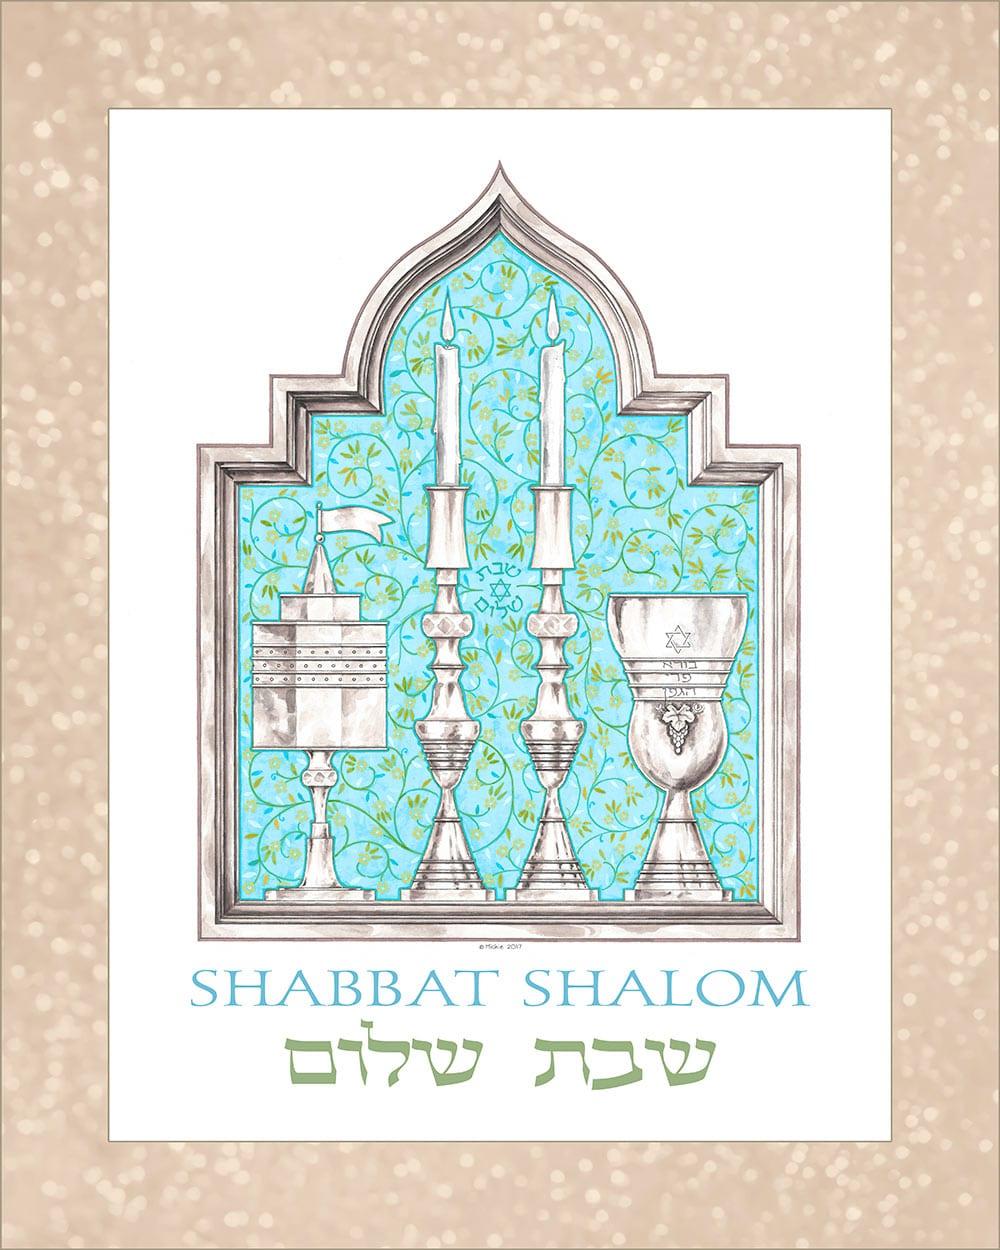 GA-2c Shabbat Shalom Wall Art AQUA